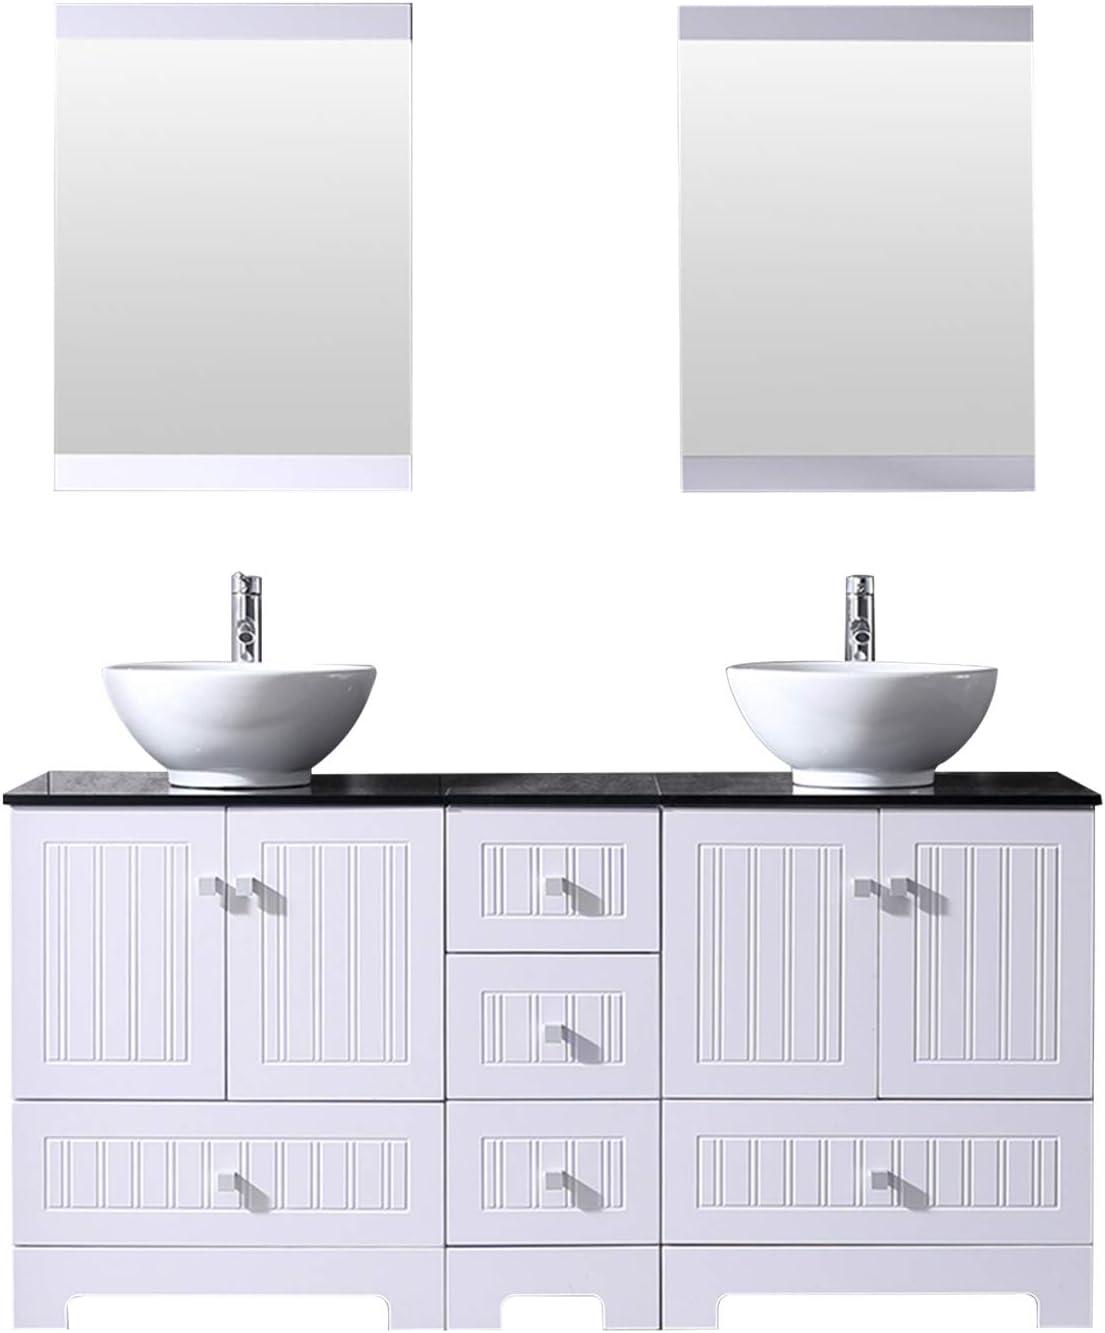 Sliverylake 60 Bathroom Vanity Ceramic Vessel Sink Combo Pvc Cover Cabinet Black Countertop Sink Bowl W Mirror Set White Bowl Amazon Com